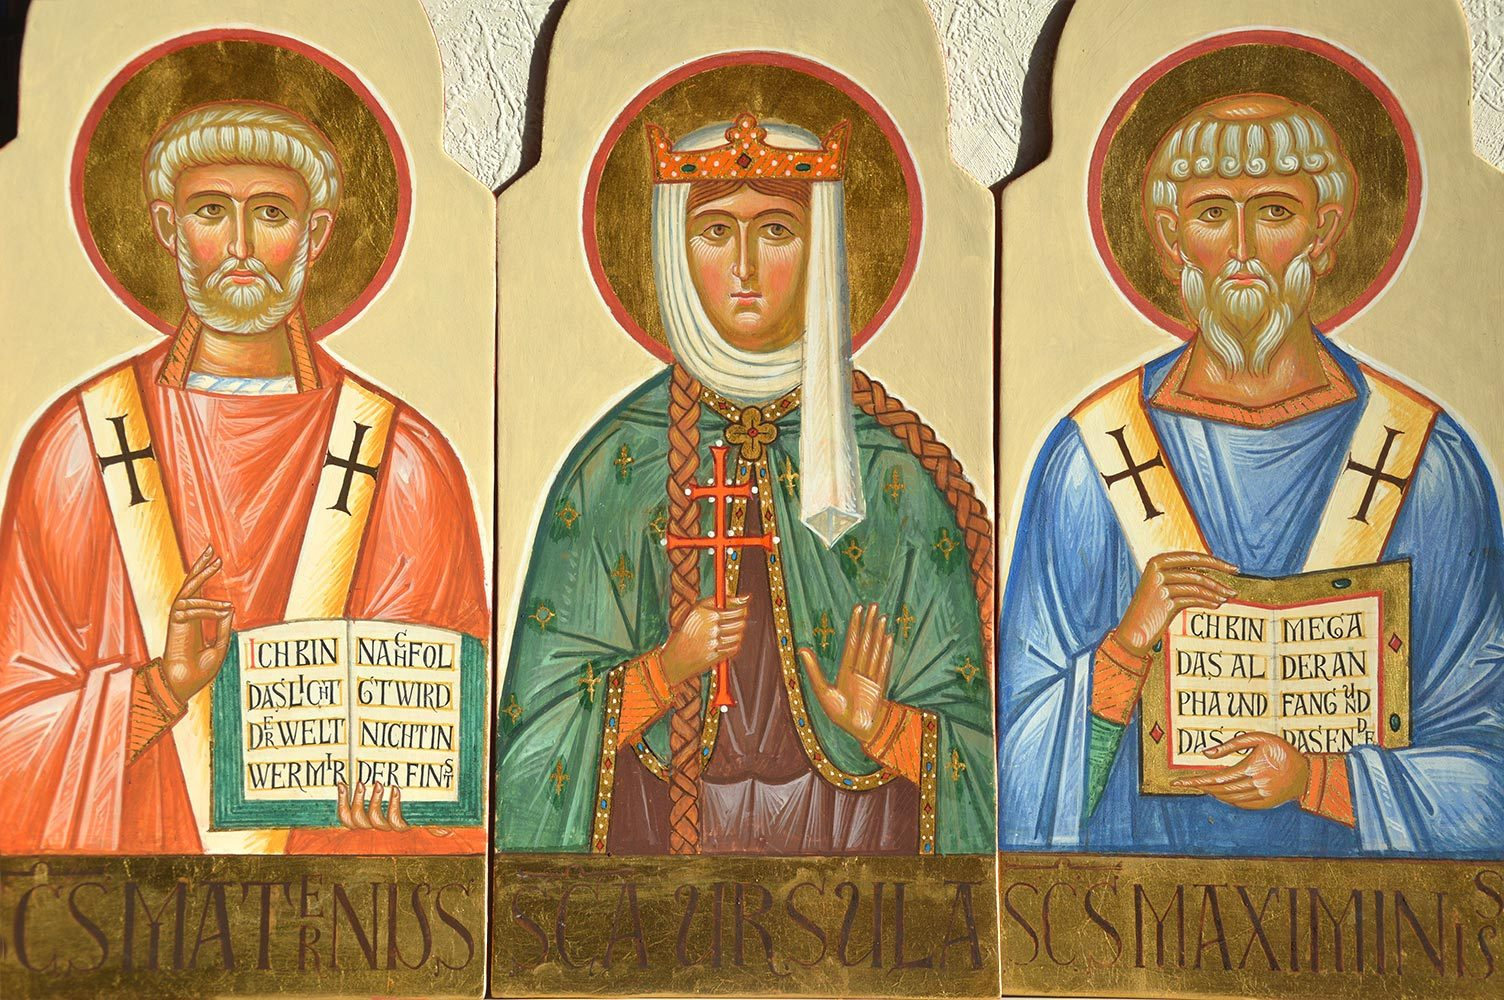 St. Maternus, St. Ursula, St. Maximinus Ikonenmalerei, Ikonen, Ikonenmaler